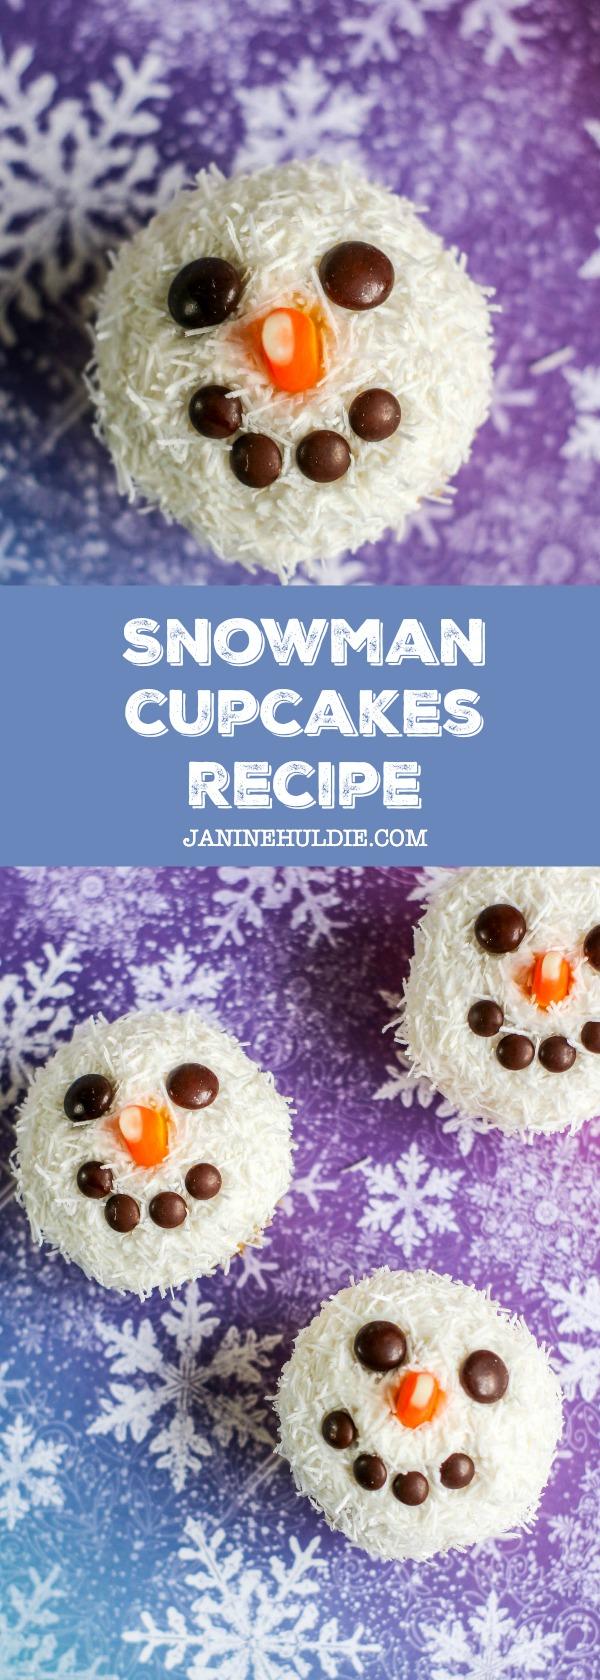 Snowman Cupcakes Recipe